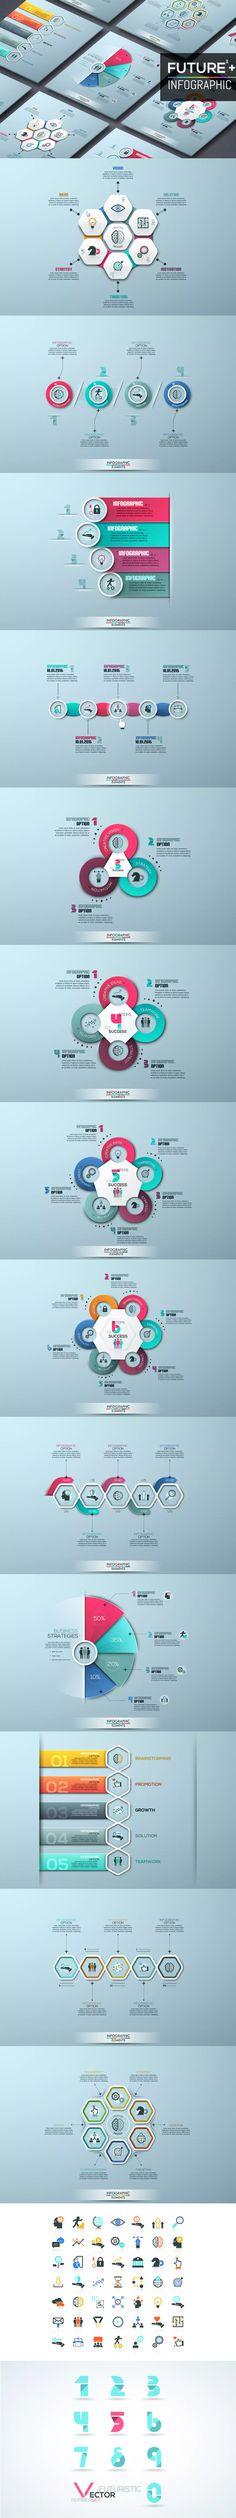 Future Infographic Template AI, EPS, PSD